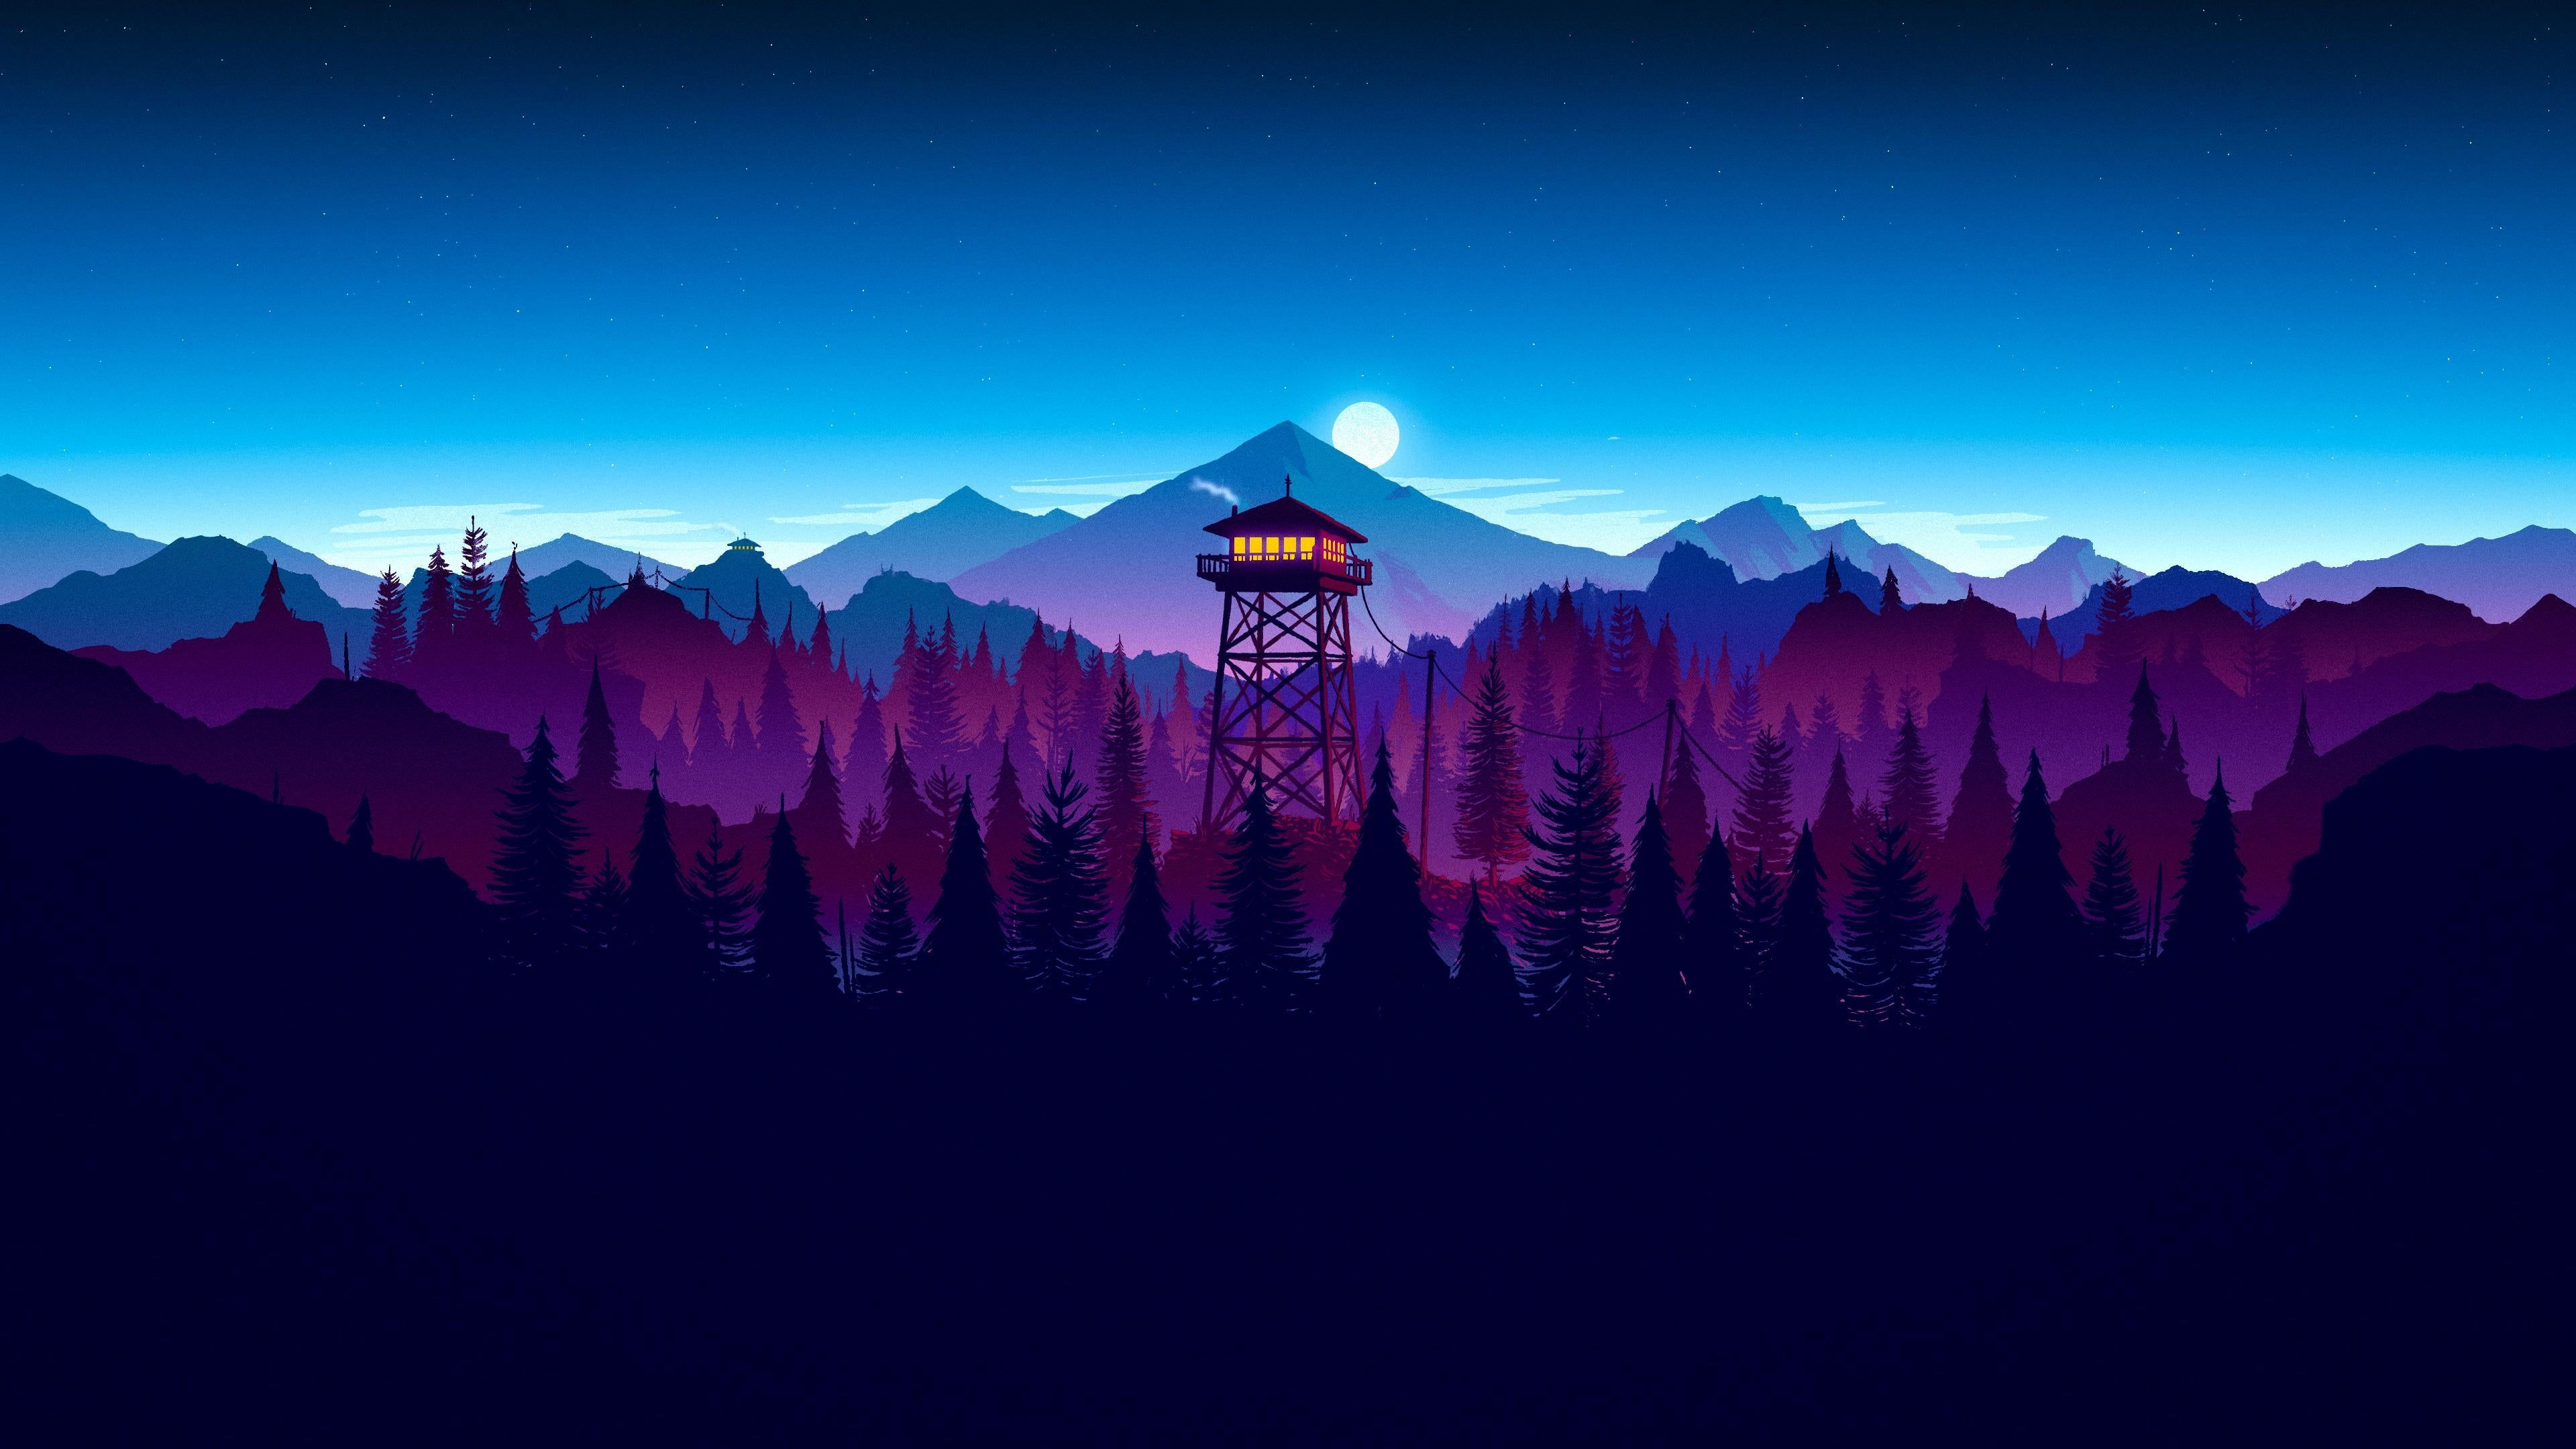 Minimalist Firewatch Good For Dual Monitors 3840x2160 In 2020 Sunset Artwork Digital Wallpaper Gaming Wallpapers